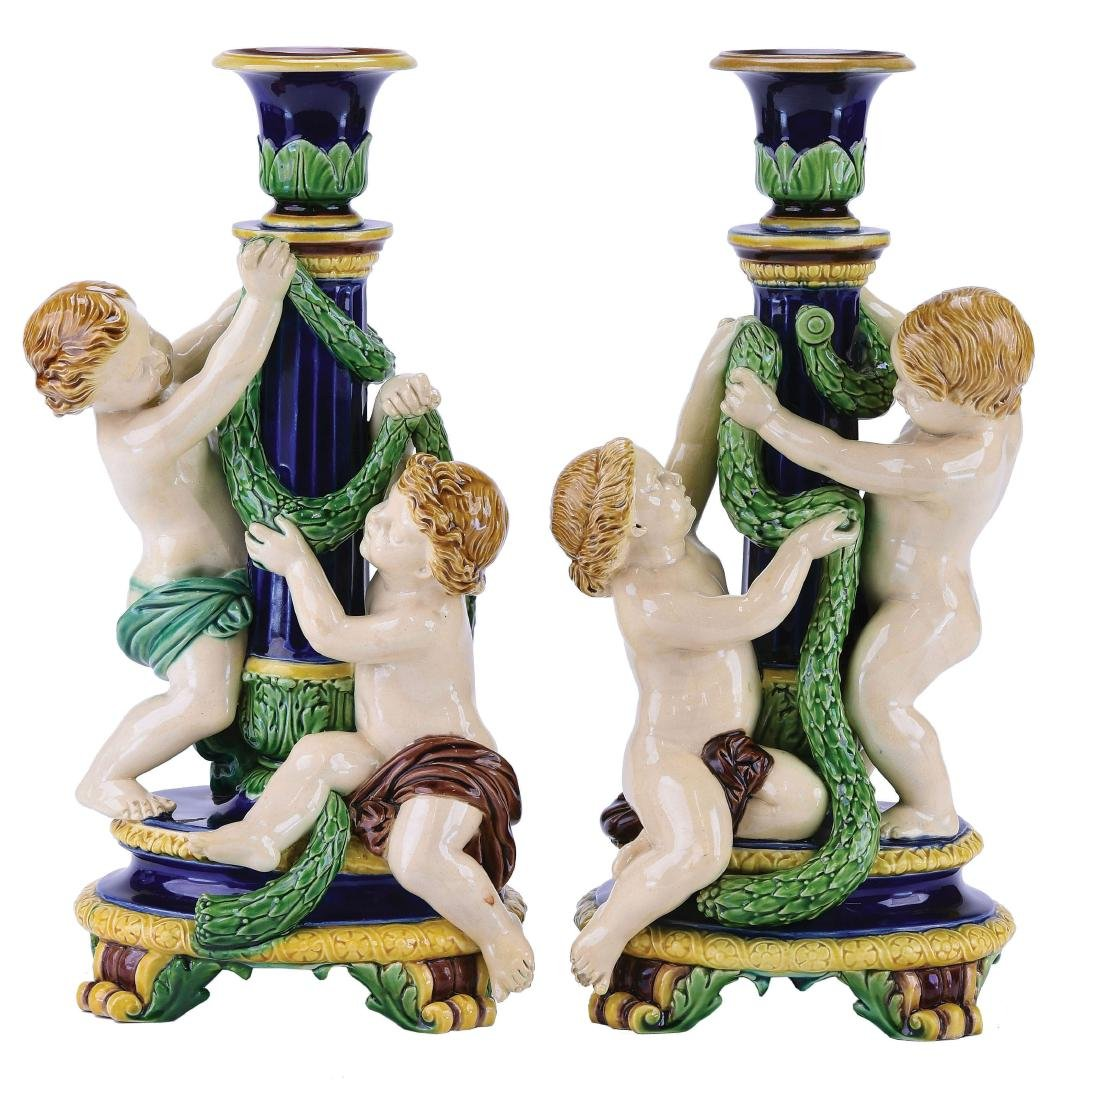 Rare Pair of Minton Majolica Putto Candlesticks